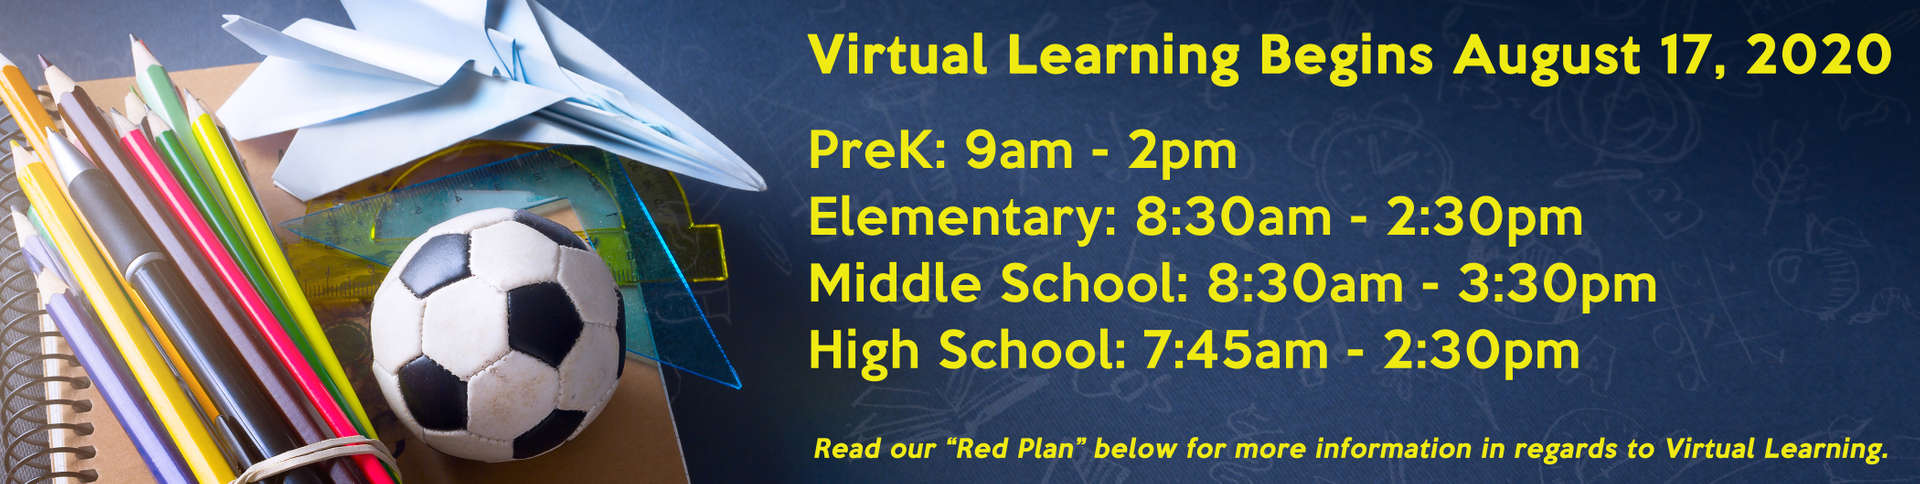 Virtual Learning Start Times